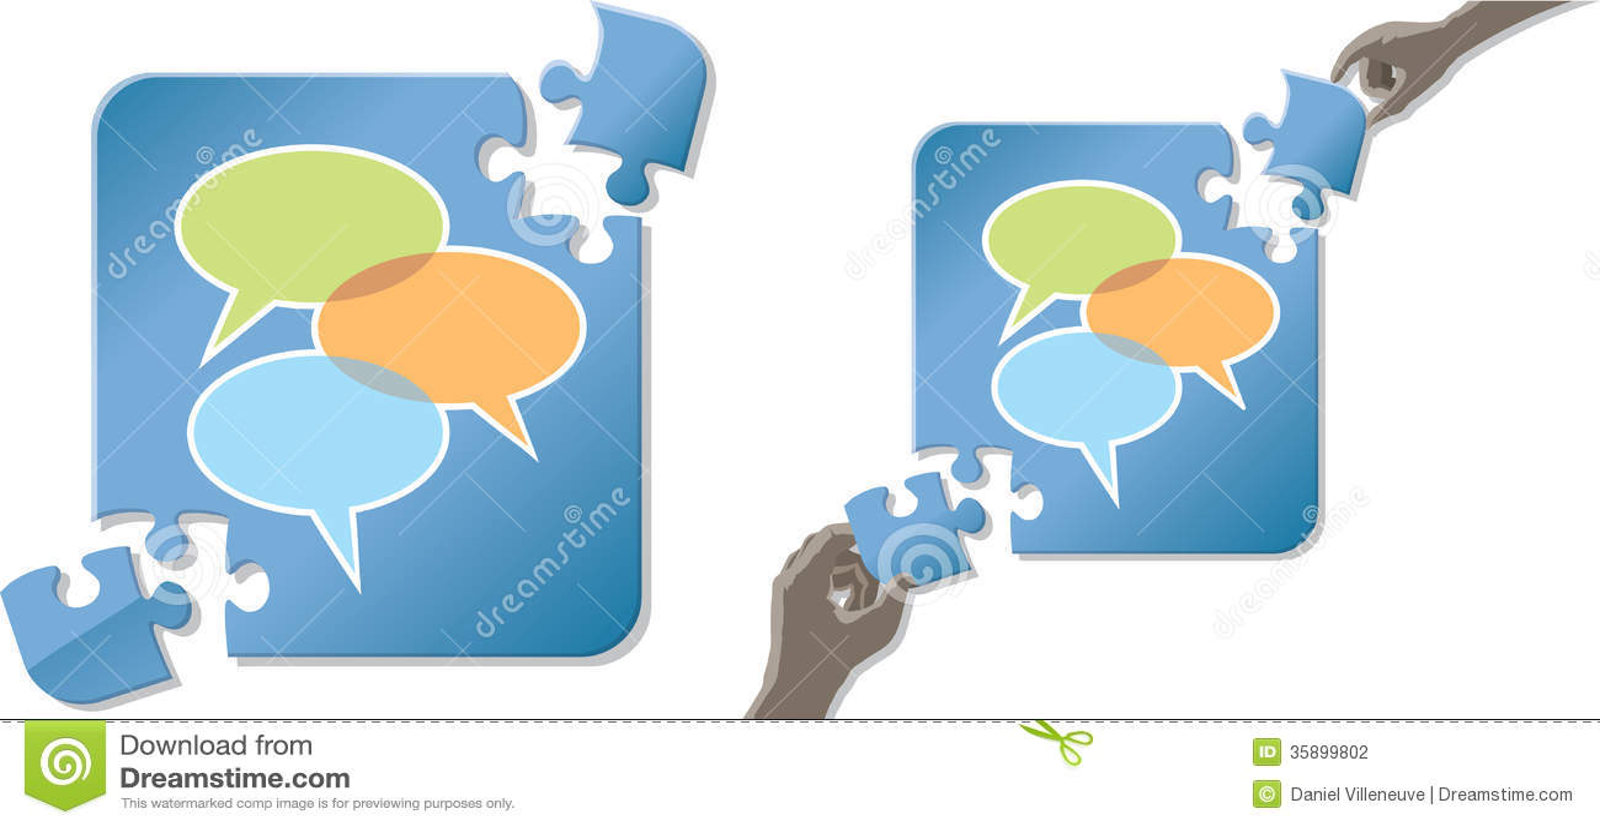 Solving Communication Problems Stock Vector - Illustration